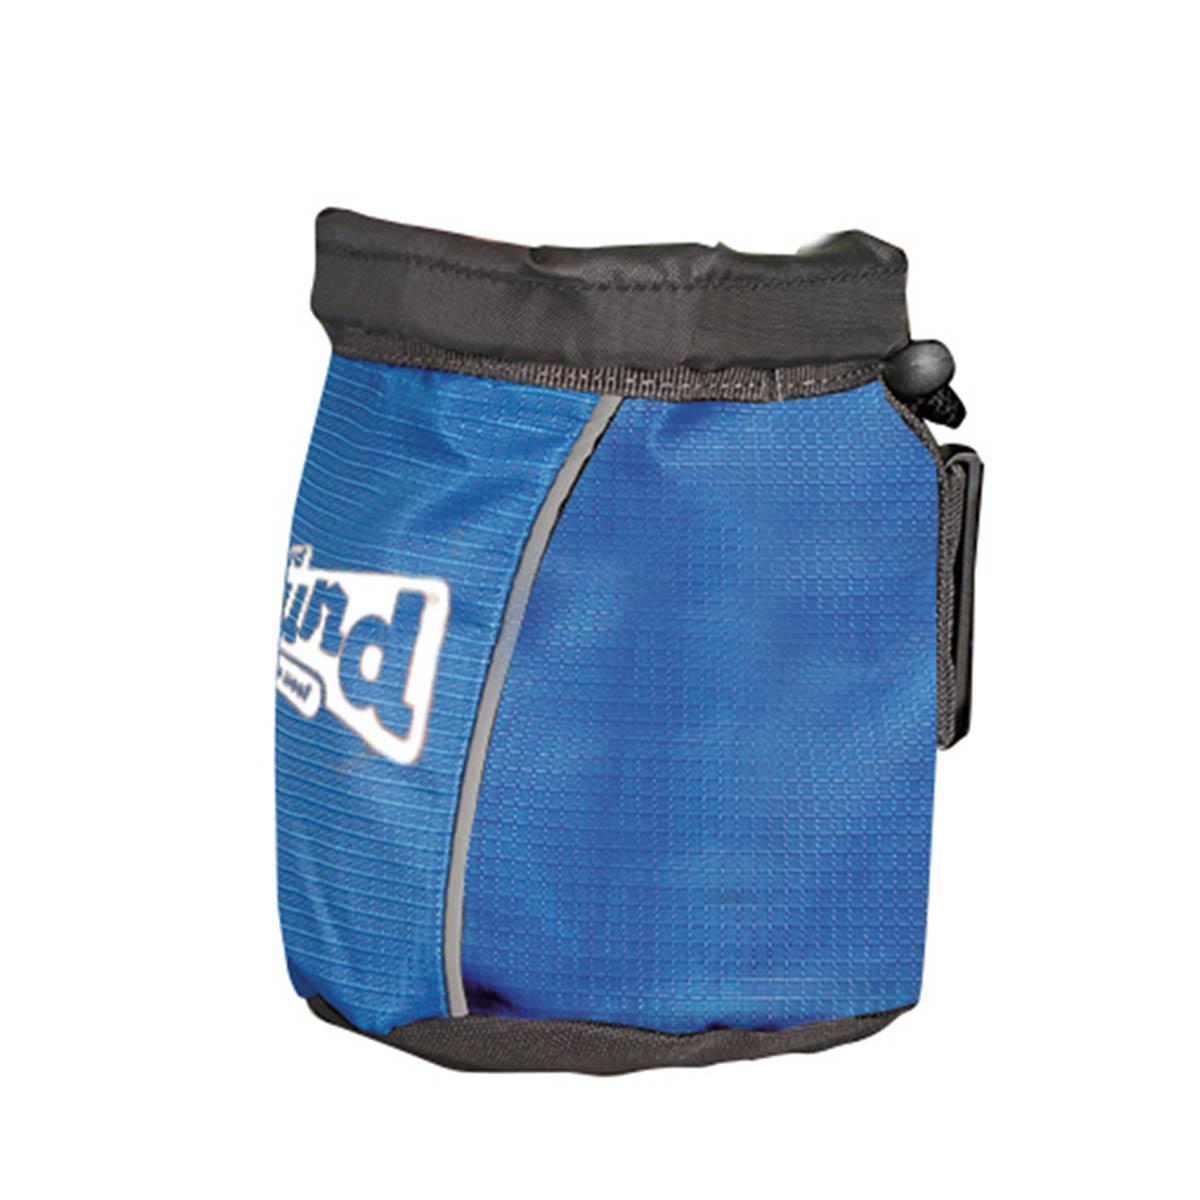 Outward Hound Treat 'N Ball Bag - Blue and Black